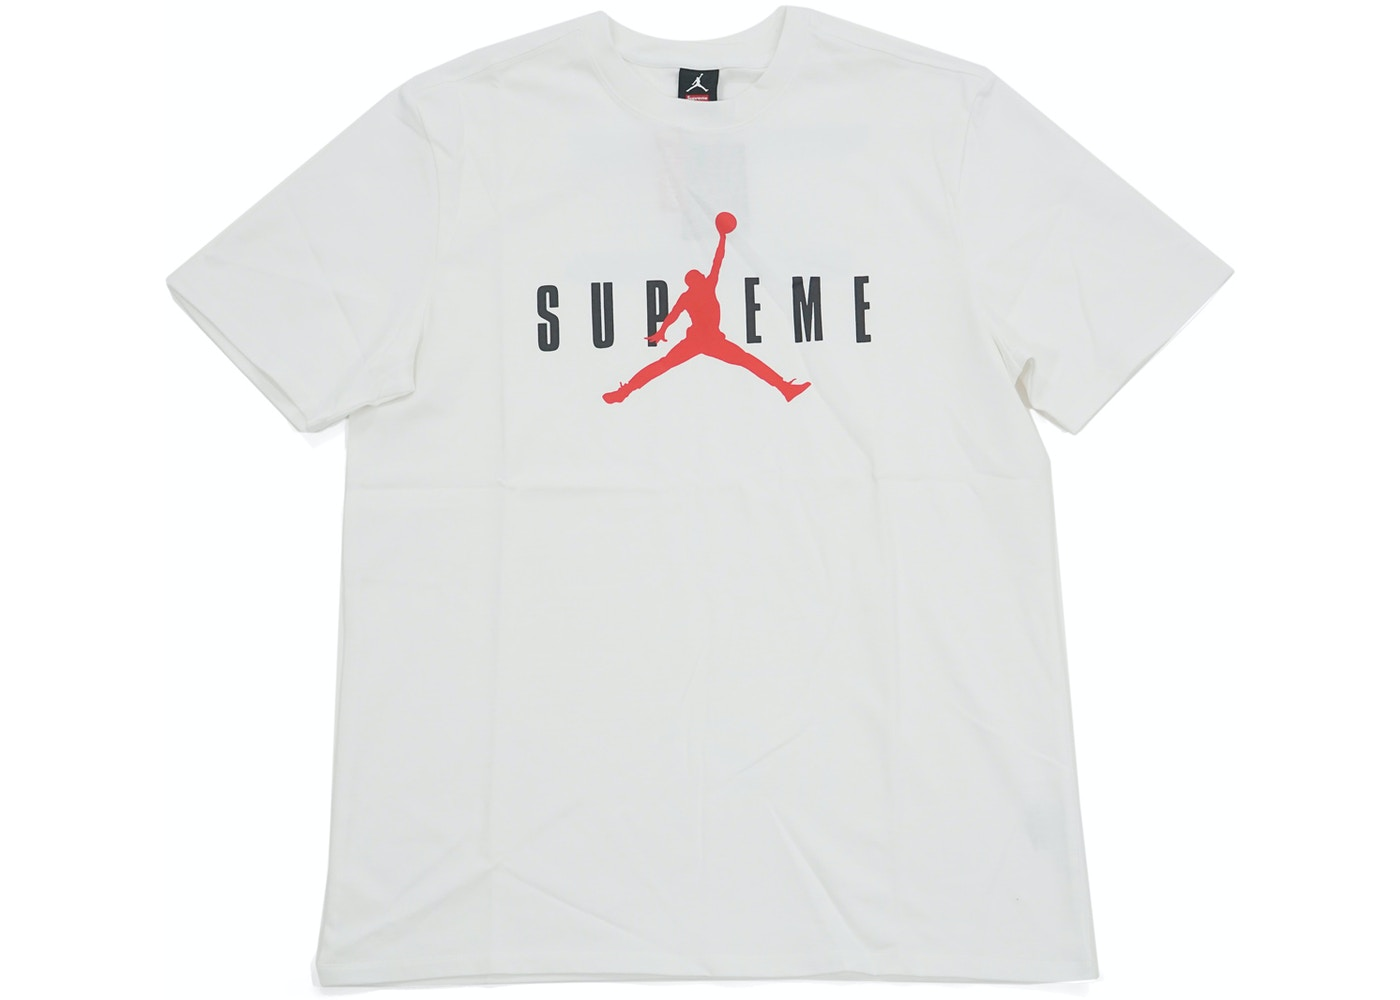 3bef3acf886f Jordan T Shirt Sale – Rockwall Auction